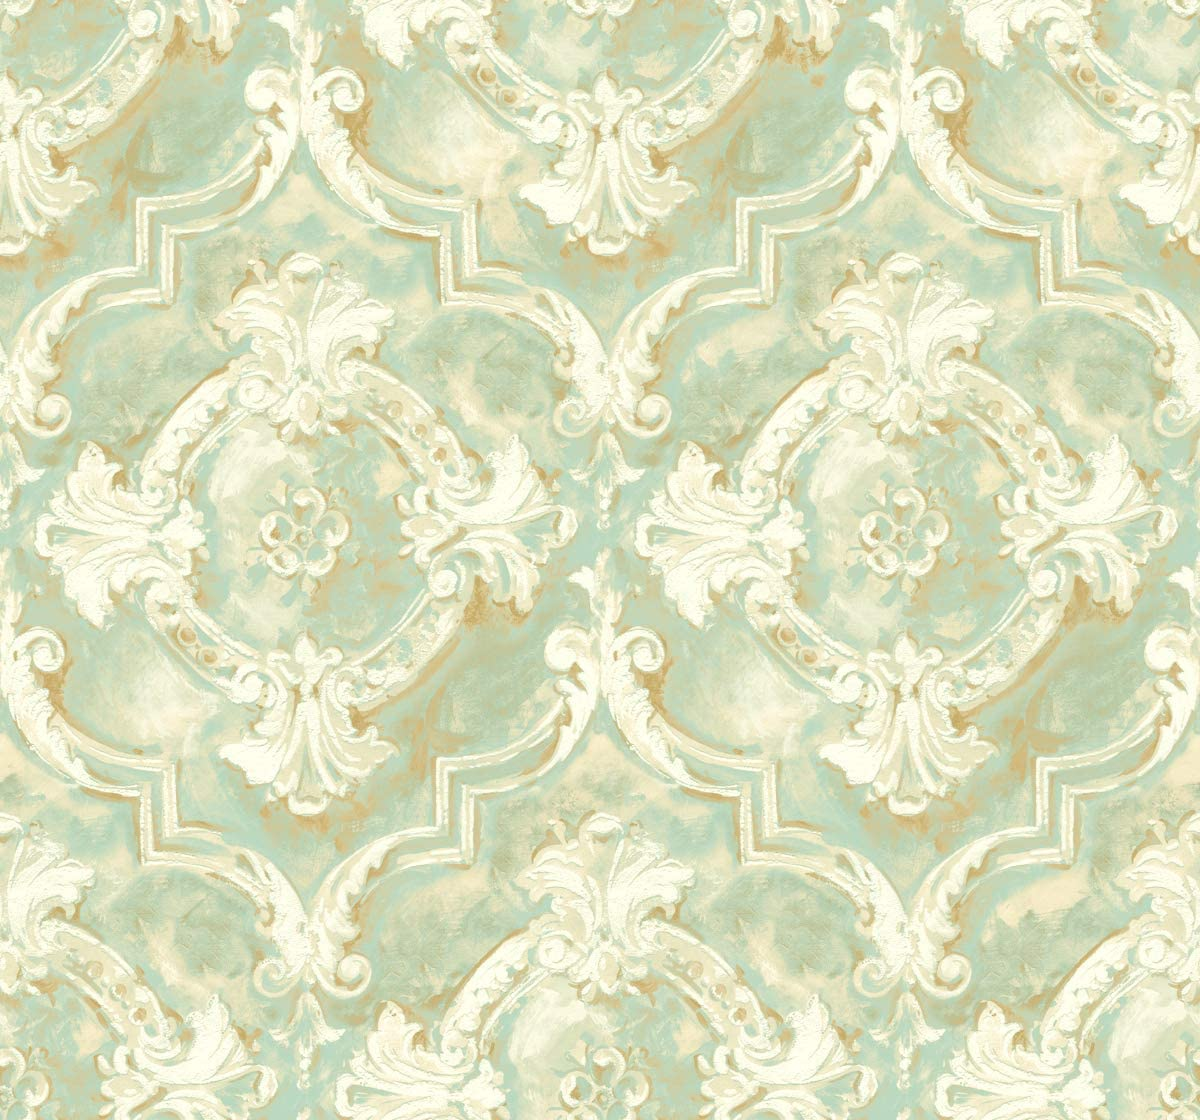 Victorian Damask Wallpaper Blue Gold Green Cream Vintage Style